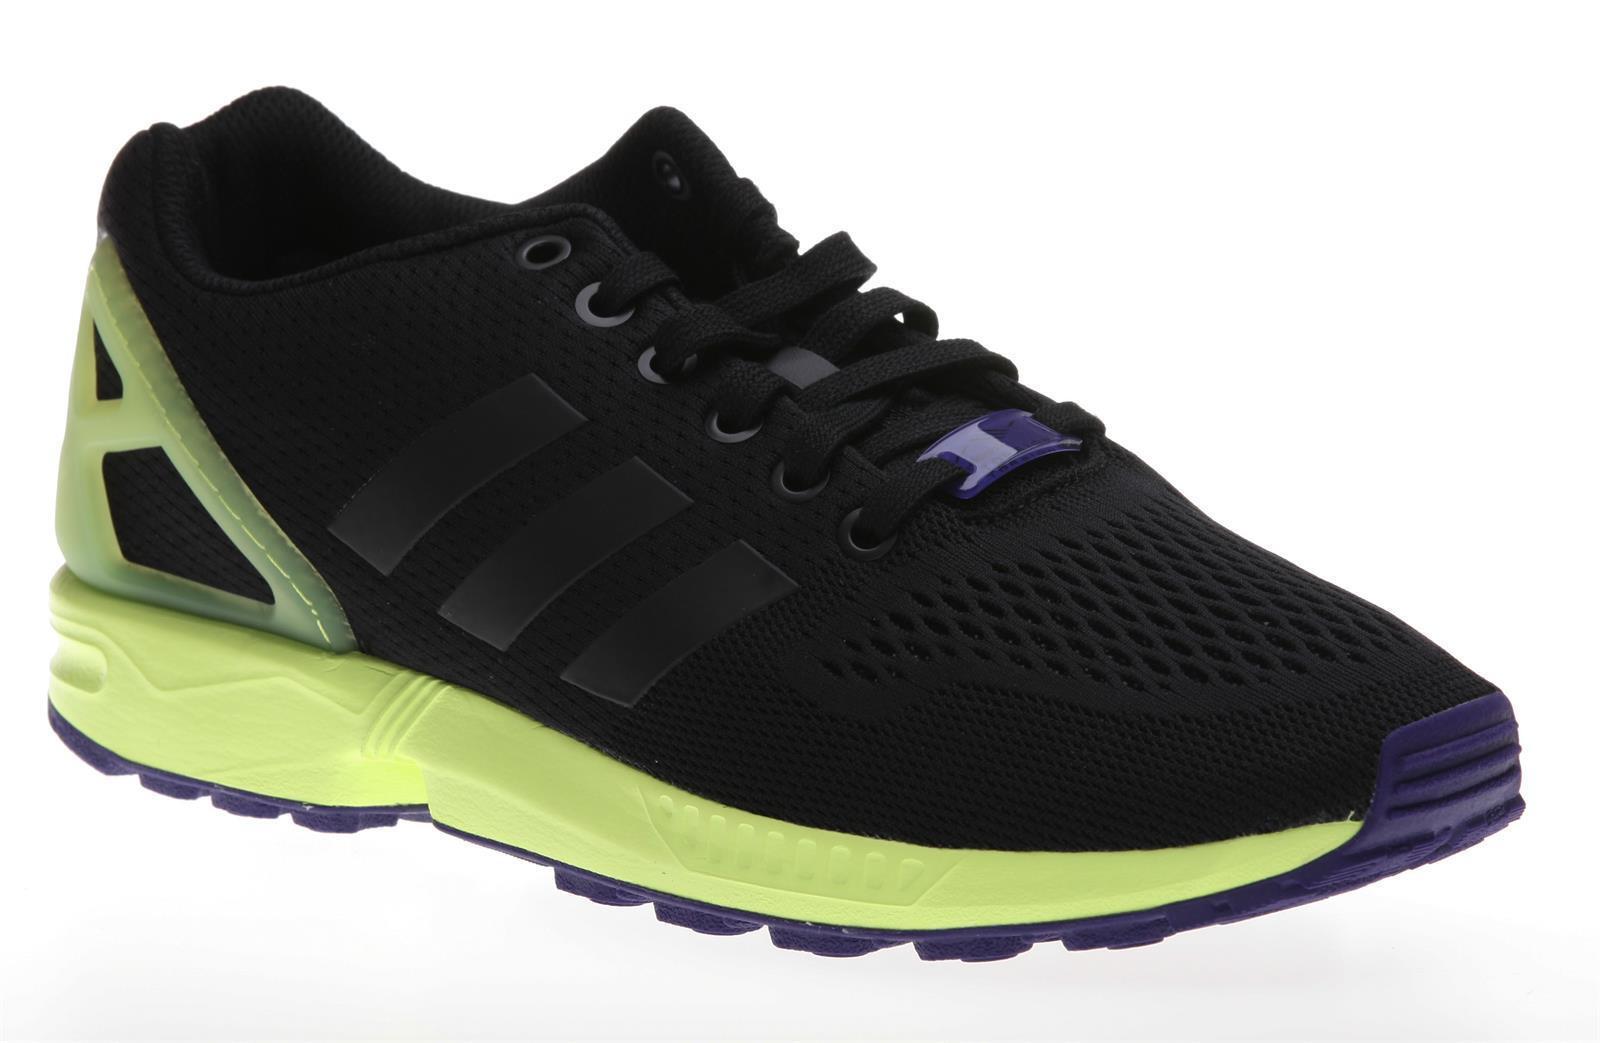 ADIDAS ZX Flux AF6318 homme  fonctionnement  chaussures  trainers sneakers, torsion